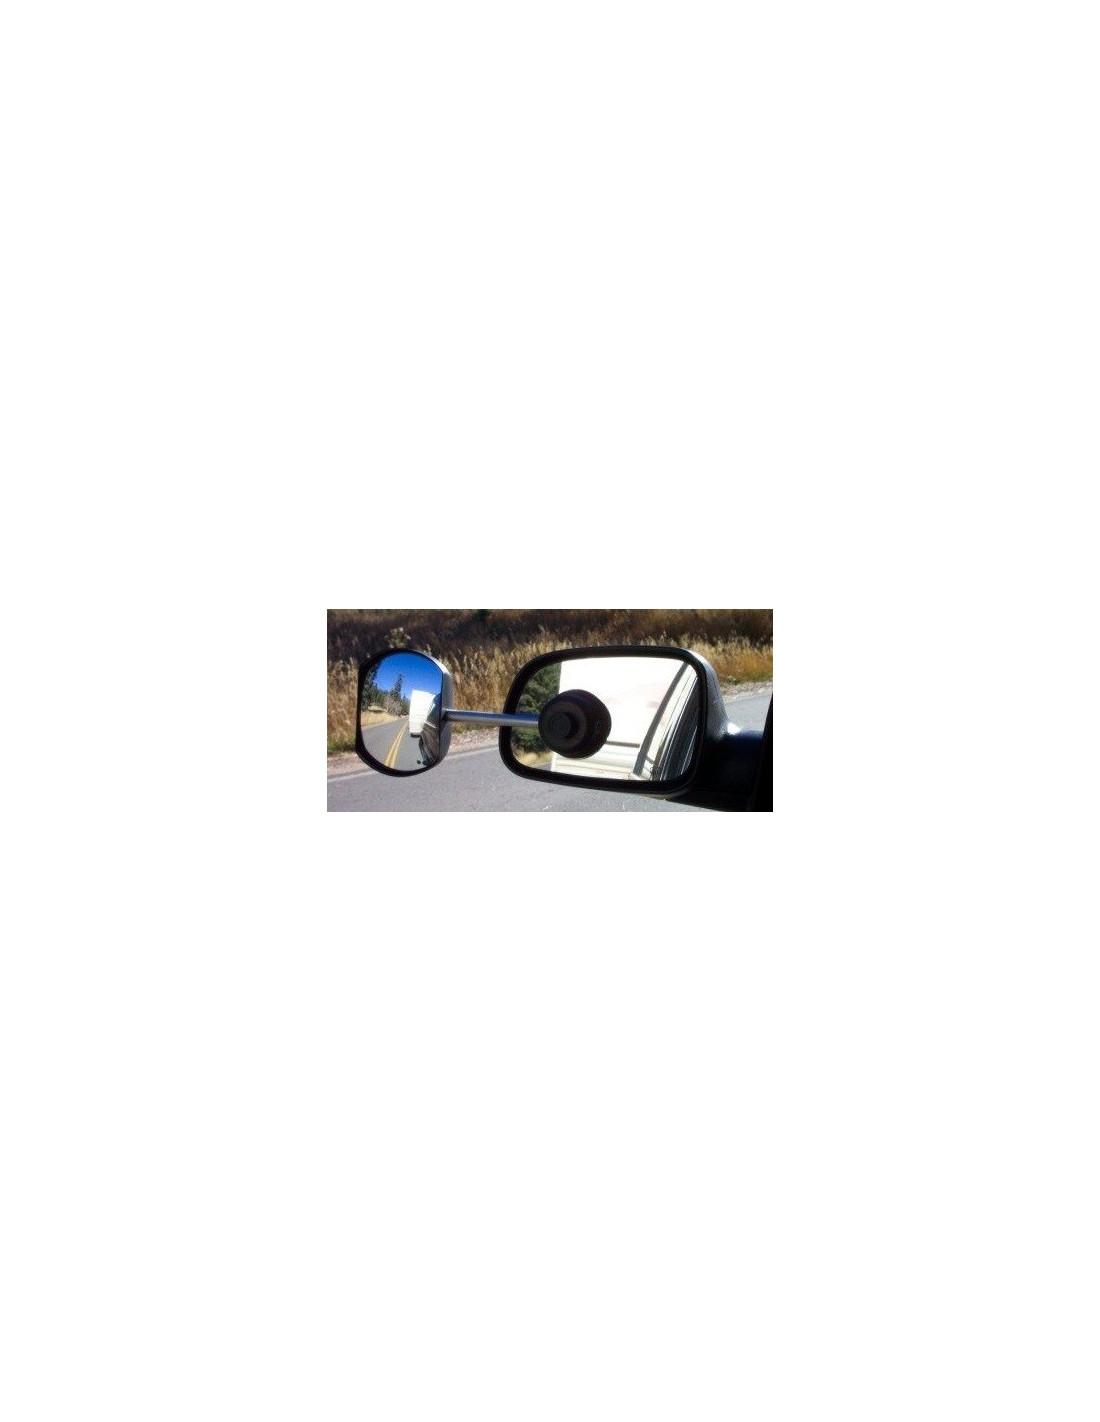 Espejo retrovisor universal con ventosa tienda de for Espejo universal tractor